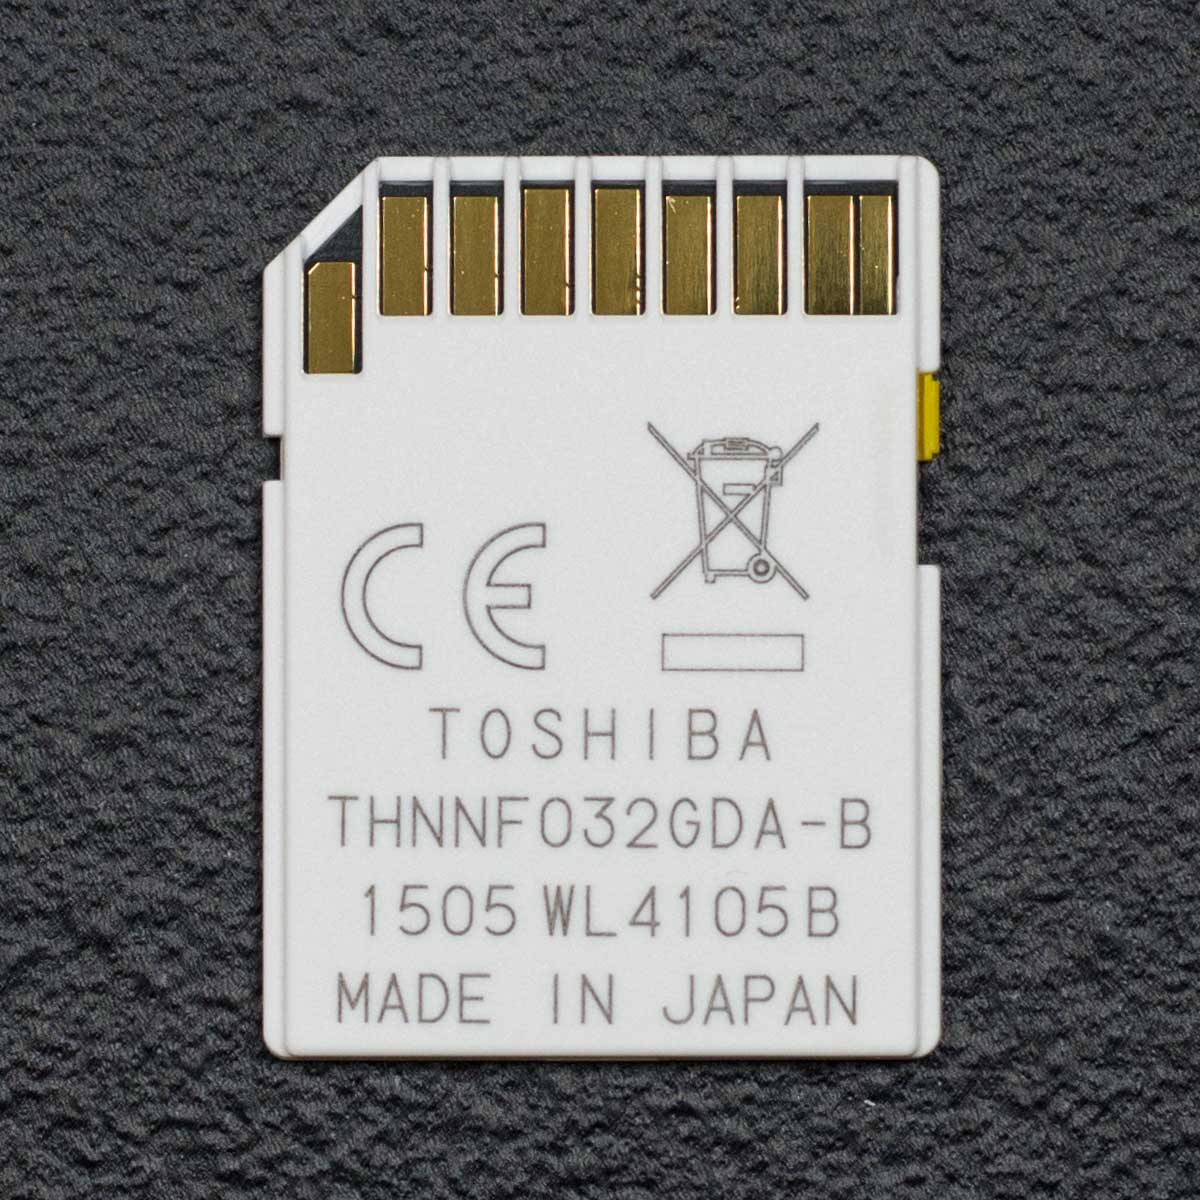 Обзор SDHC карты памяти TOSHIBA SD-T032NFC объемом 32 ГБ